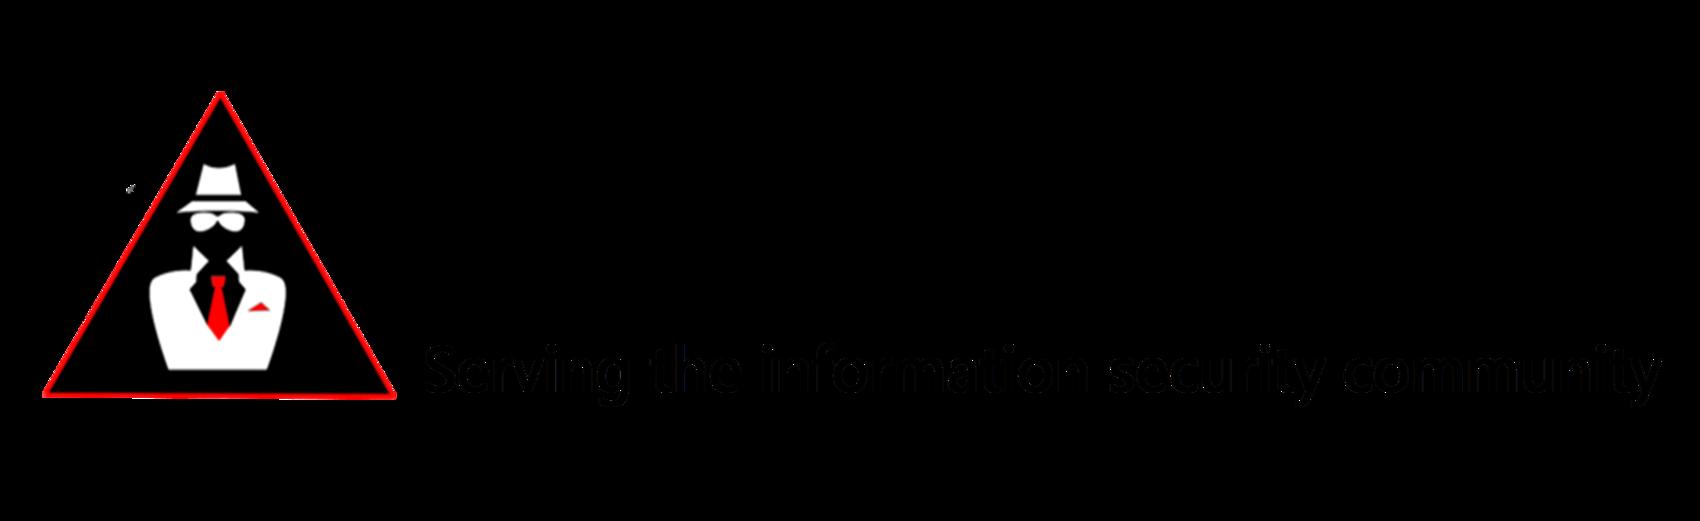 Reddit | InfoSec Industry